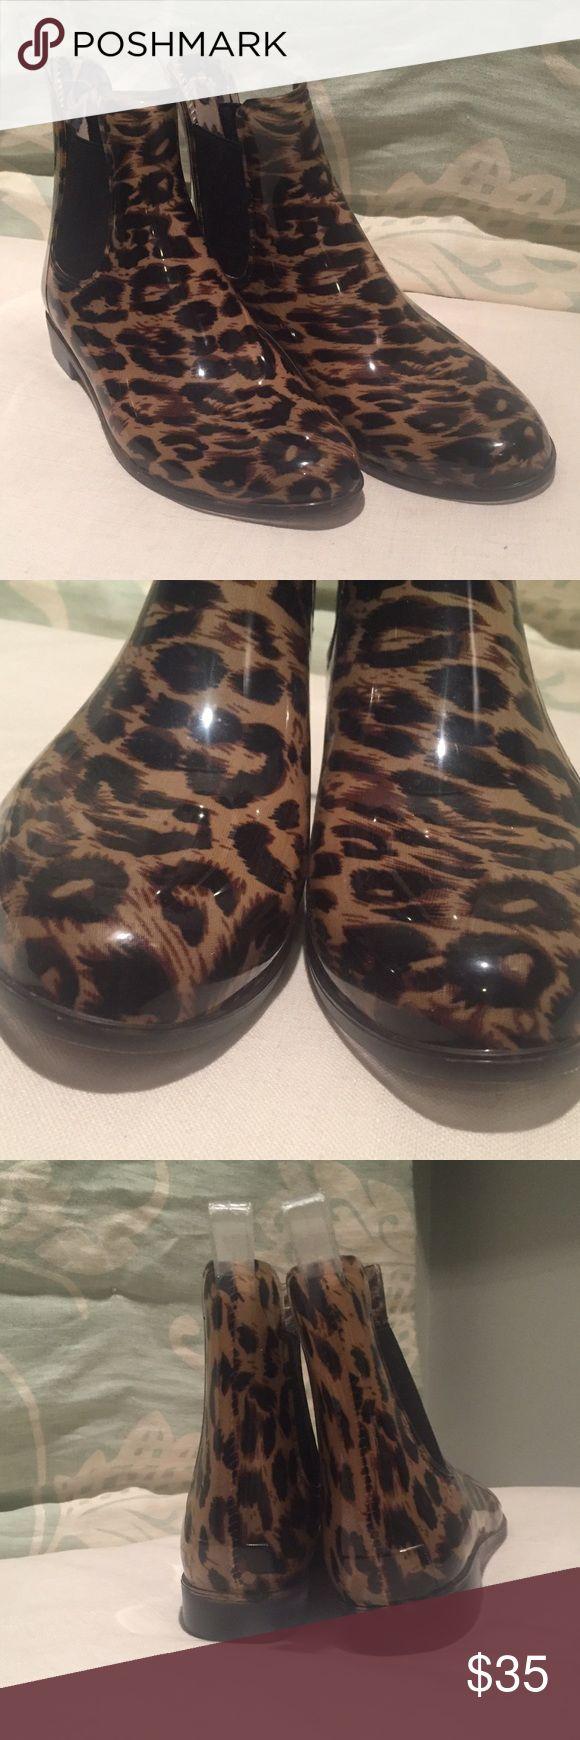 J crew rain boots 8 J crew rain boots 8 J. Crew Shoes Winter & Rain Boots